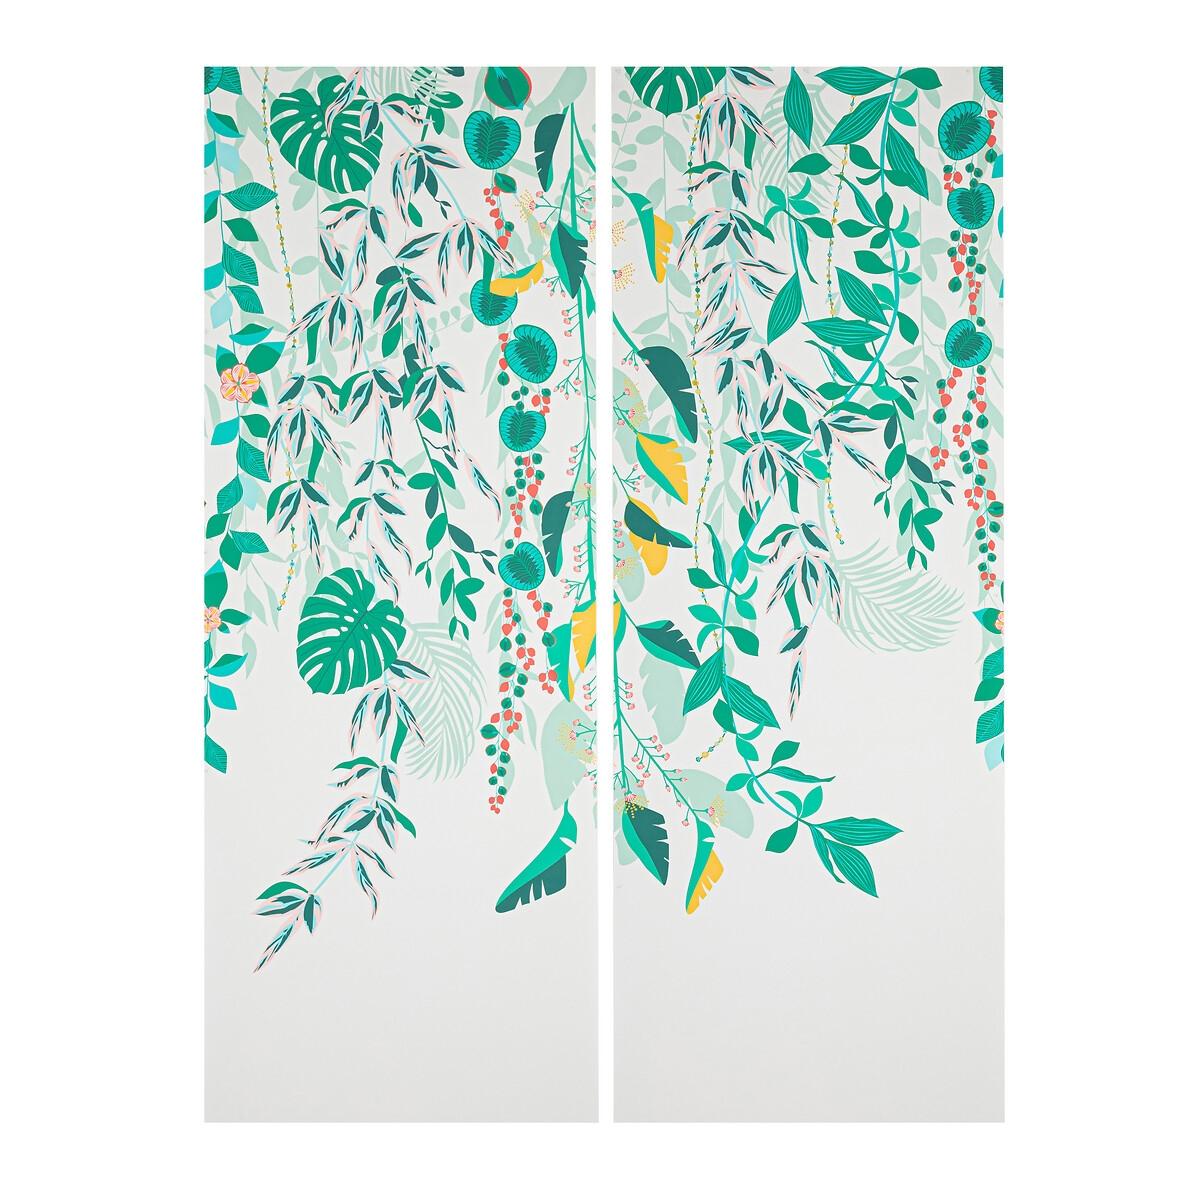 Papier peint panoramique motif fleuri 2,7 m Angkor